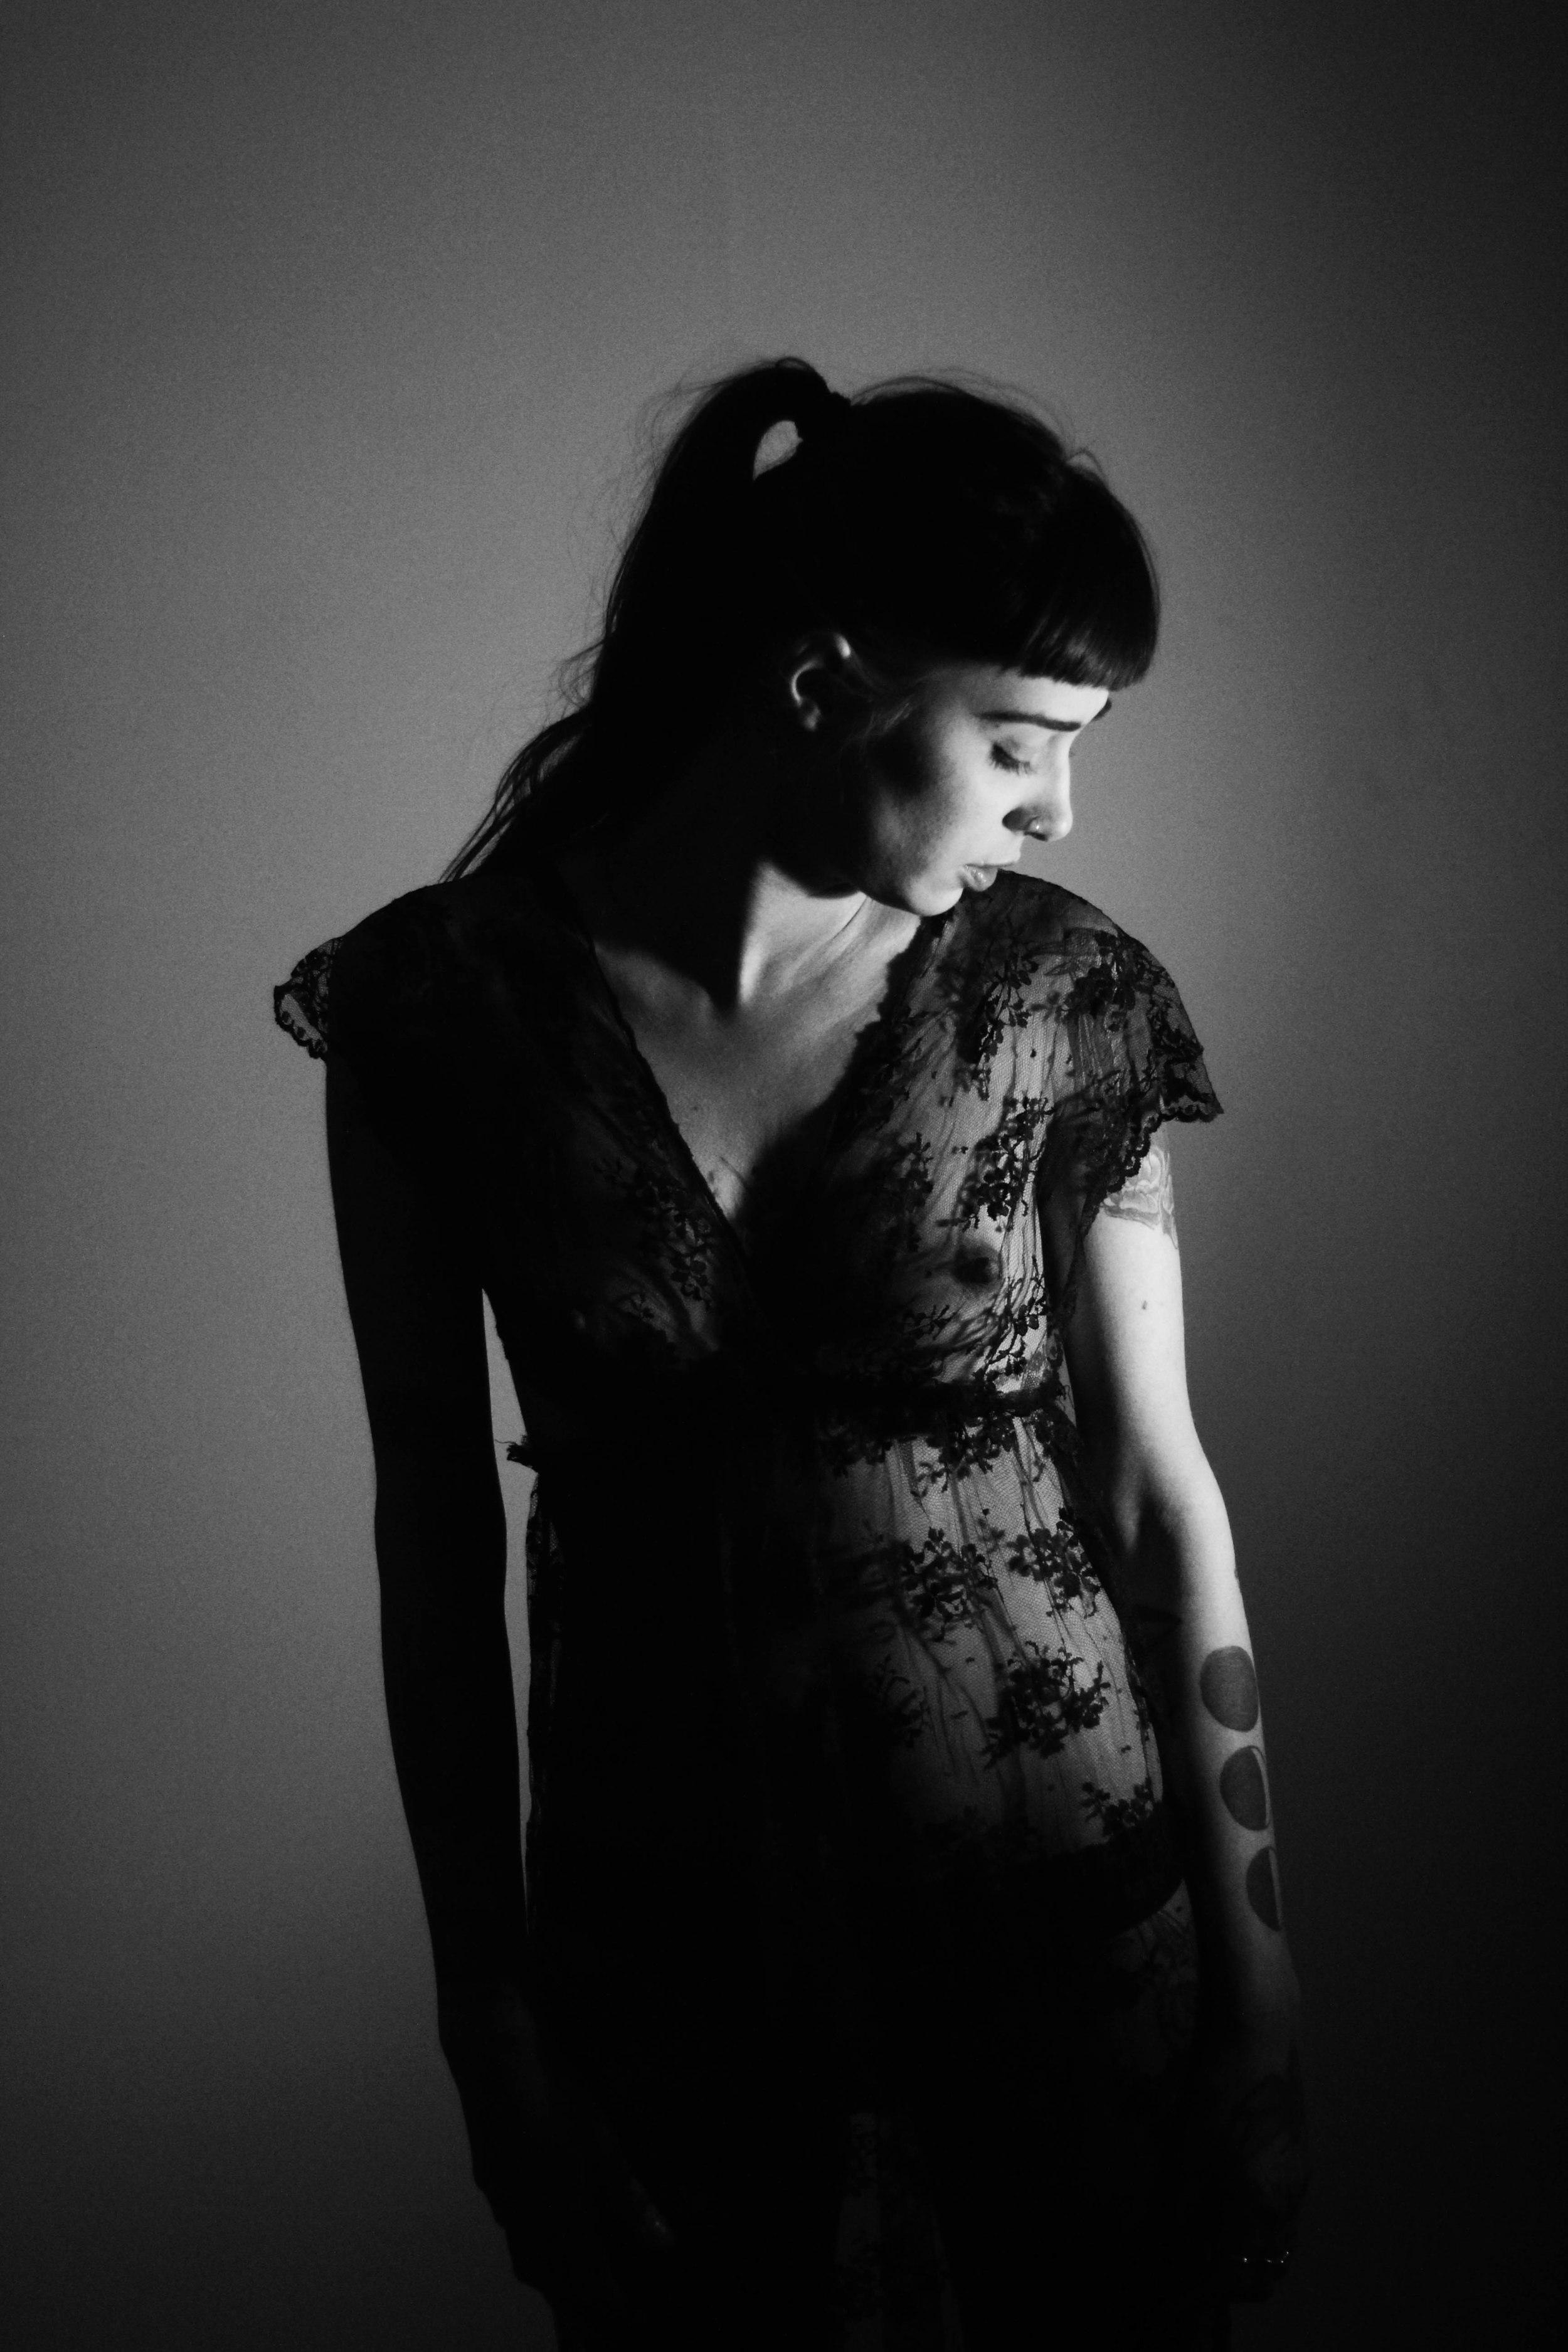 Carolina_Mencia-Sal_Nunkachov-07.jpg